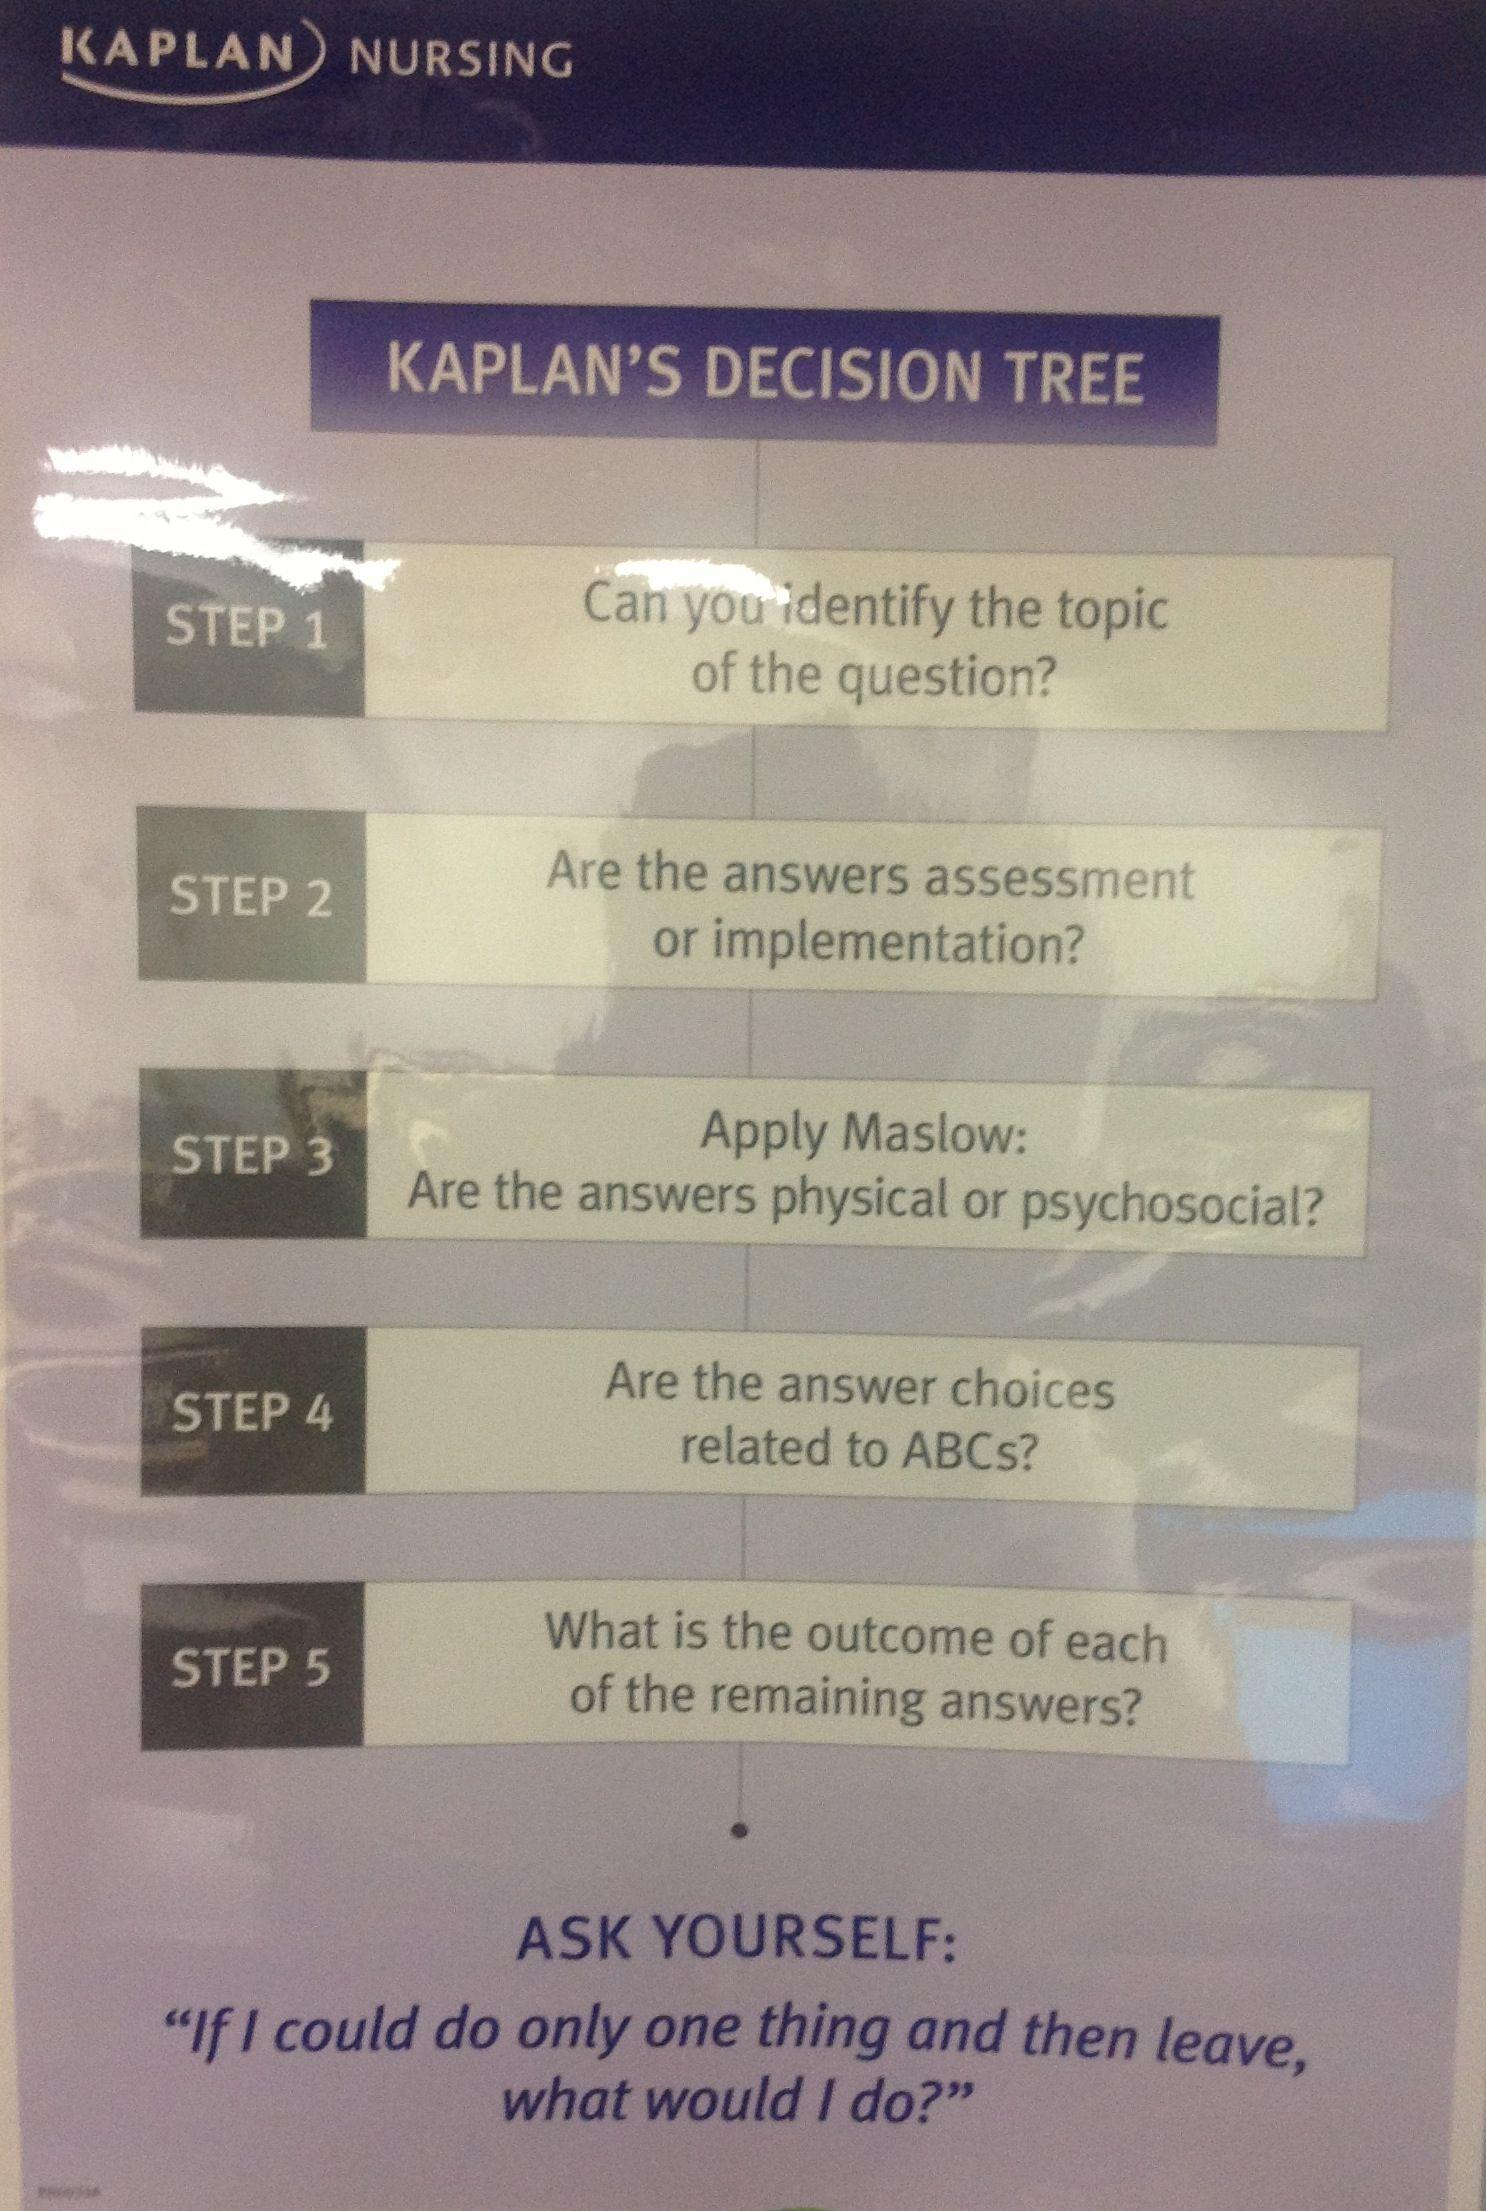 Kaplan Nursing: Decision Tree | Nursing School | Pinterest | Trees ...